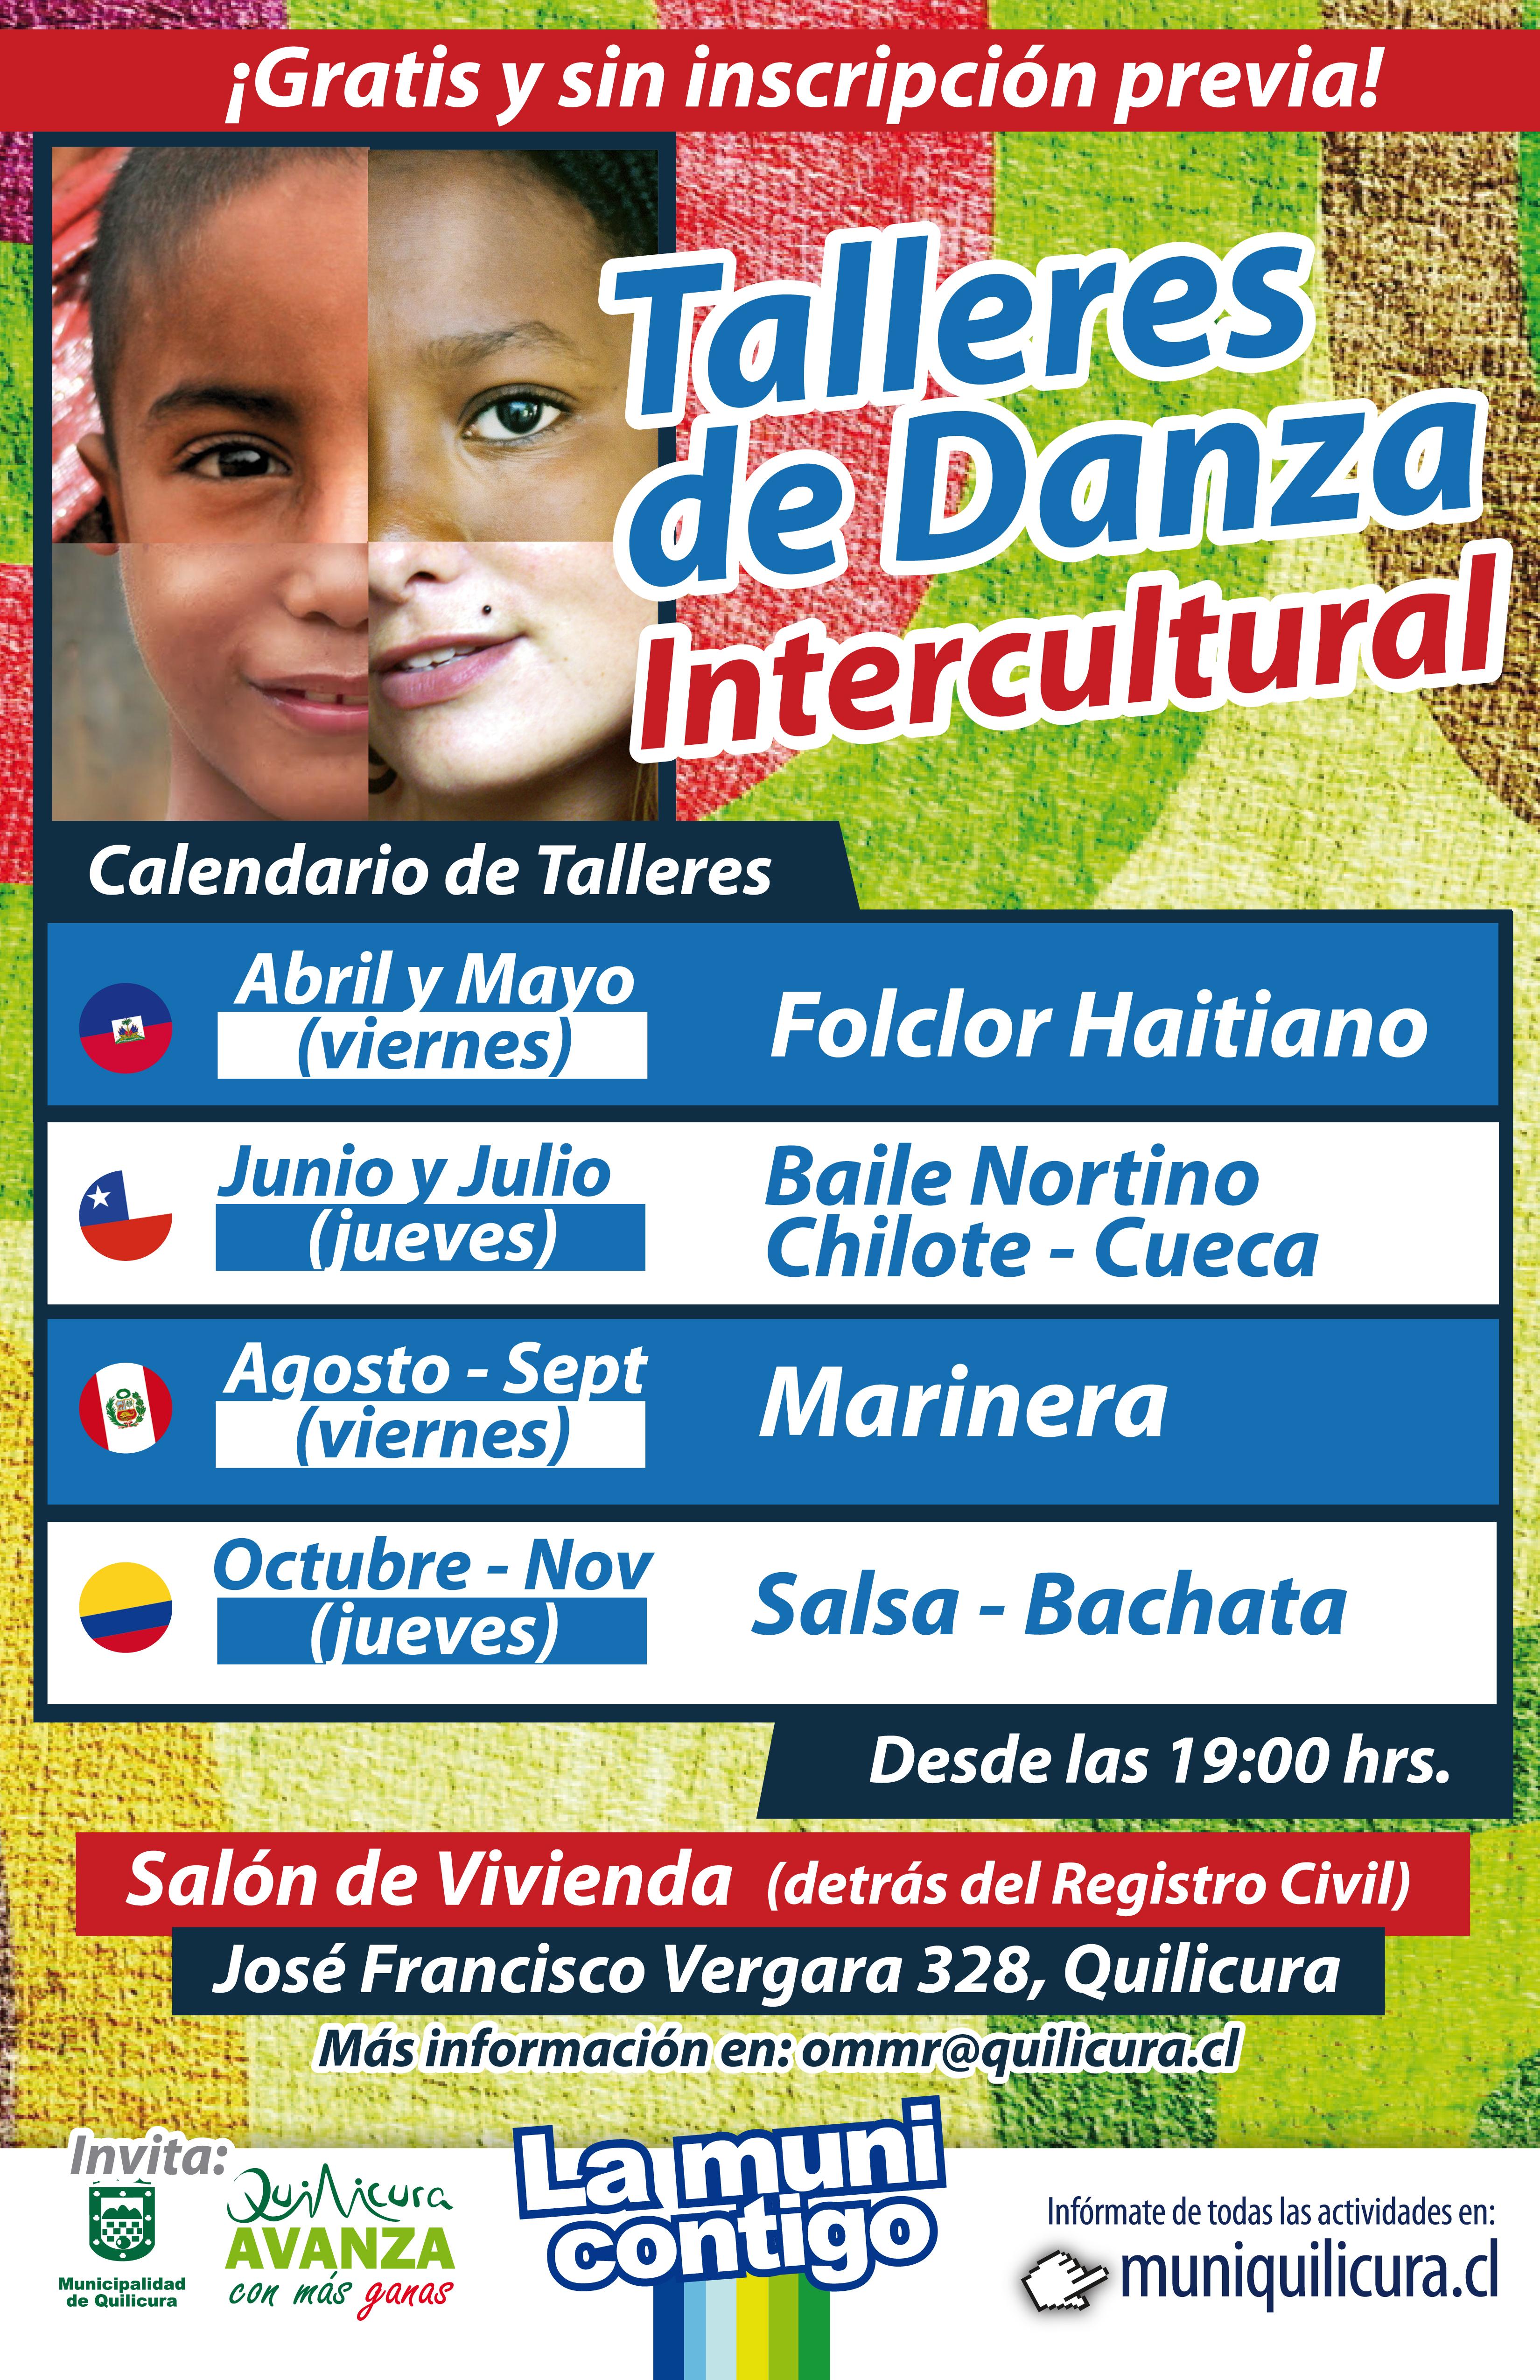 Talleres de Danza Intercultural en Quilicura